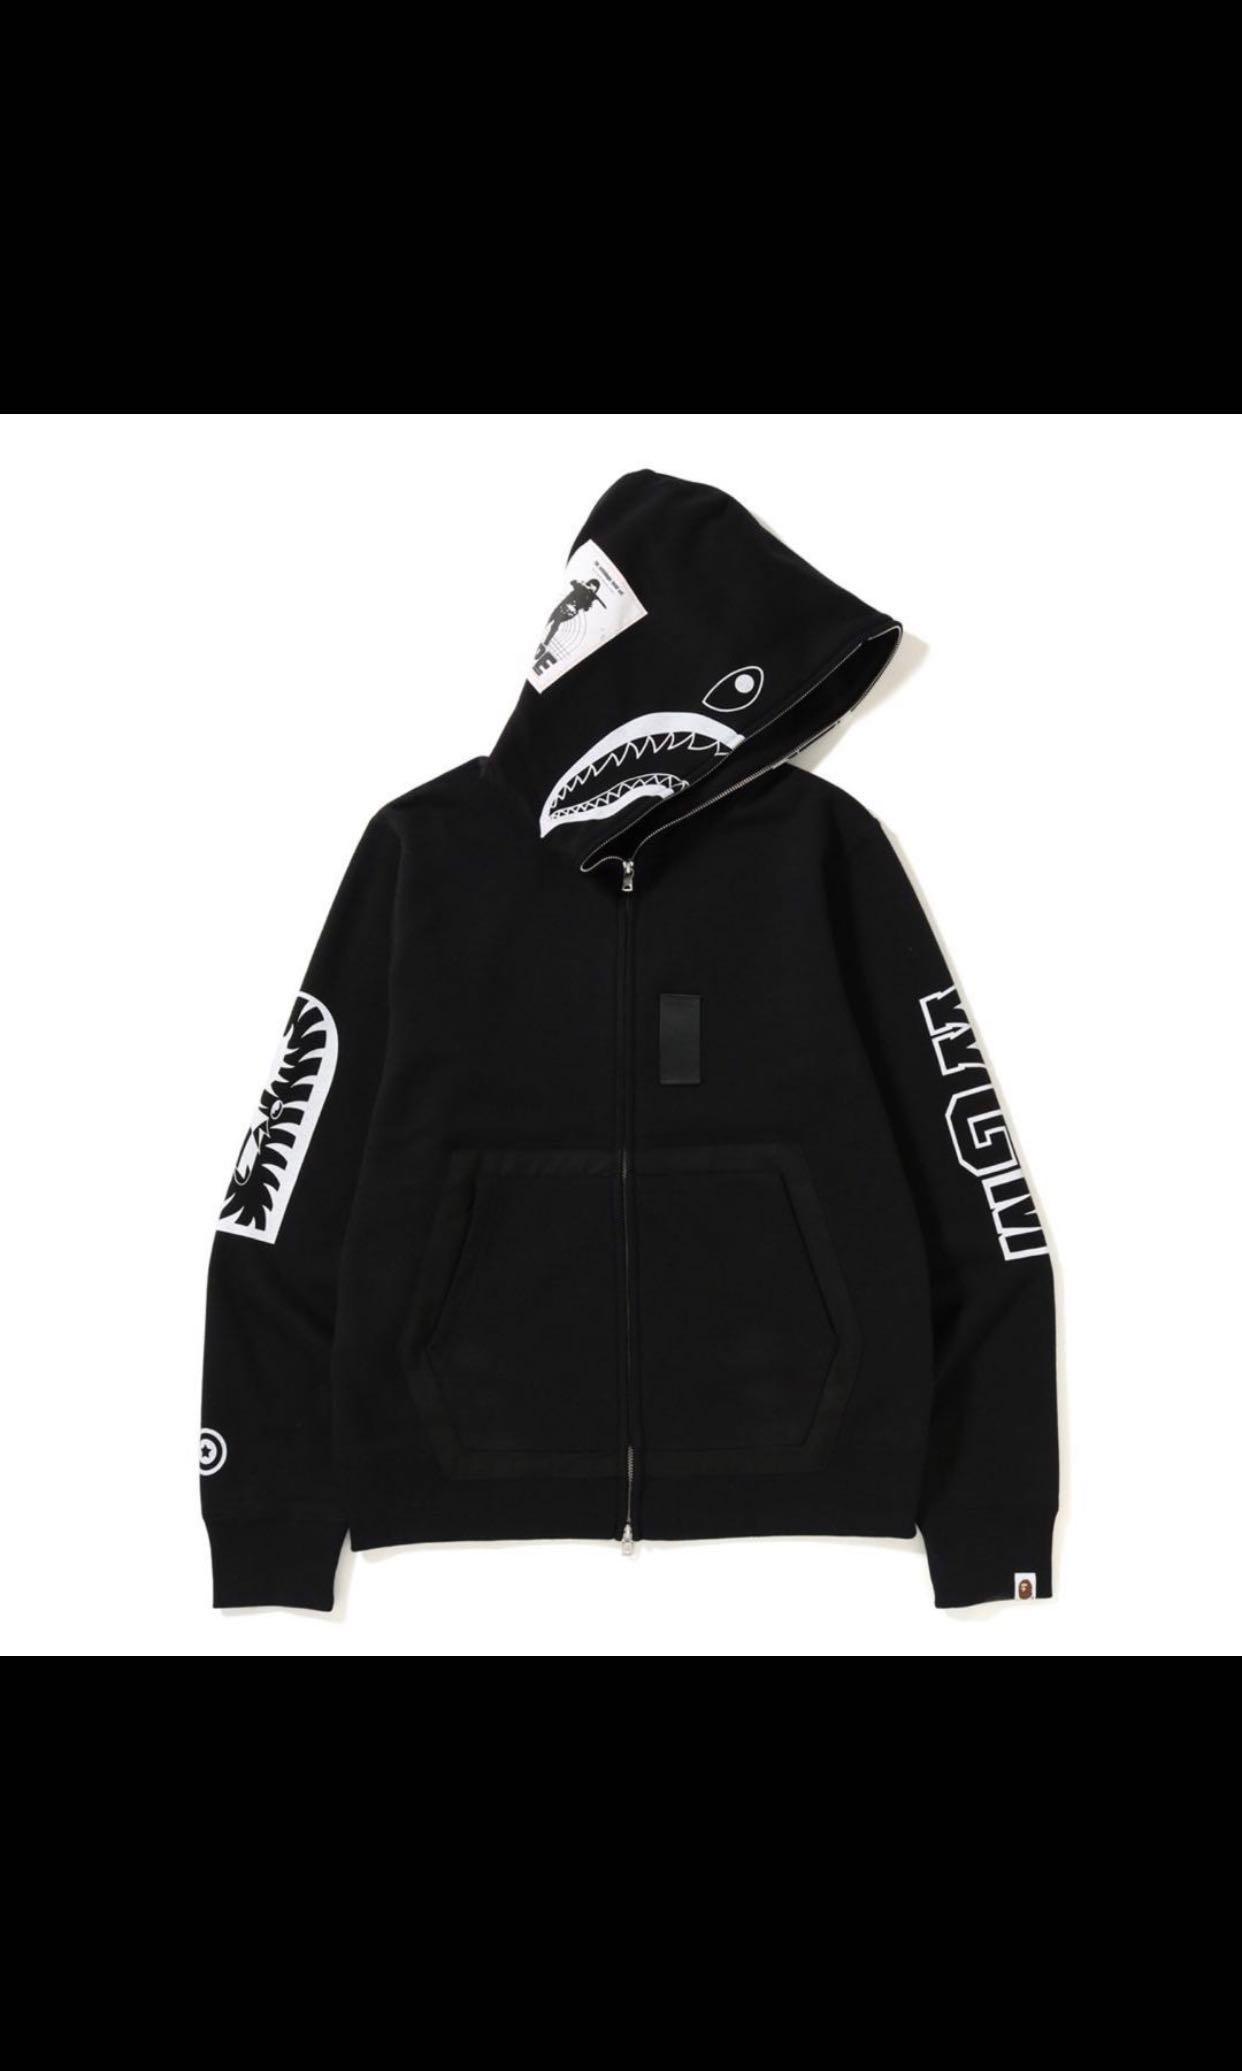 2b1068e72f0d Bape military shark full zip hoodie